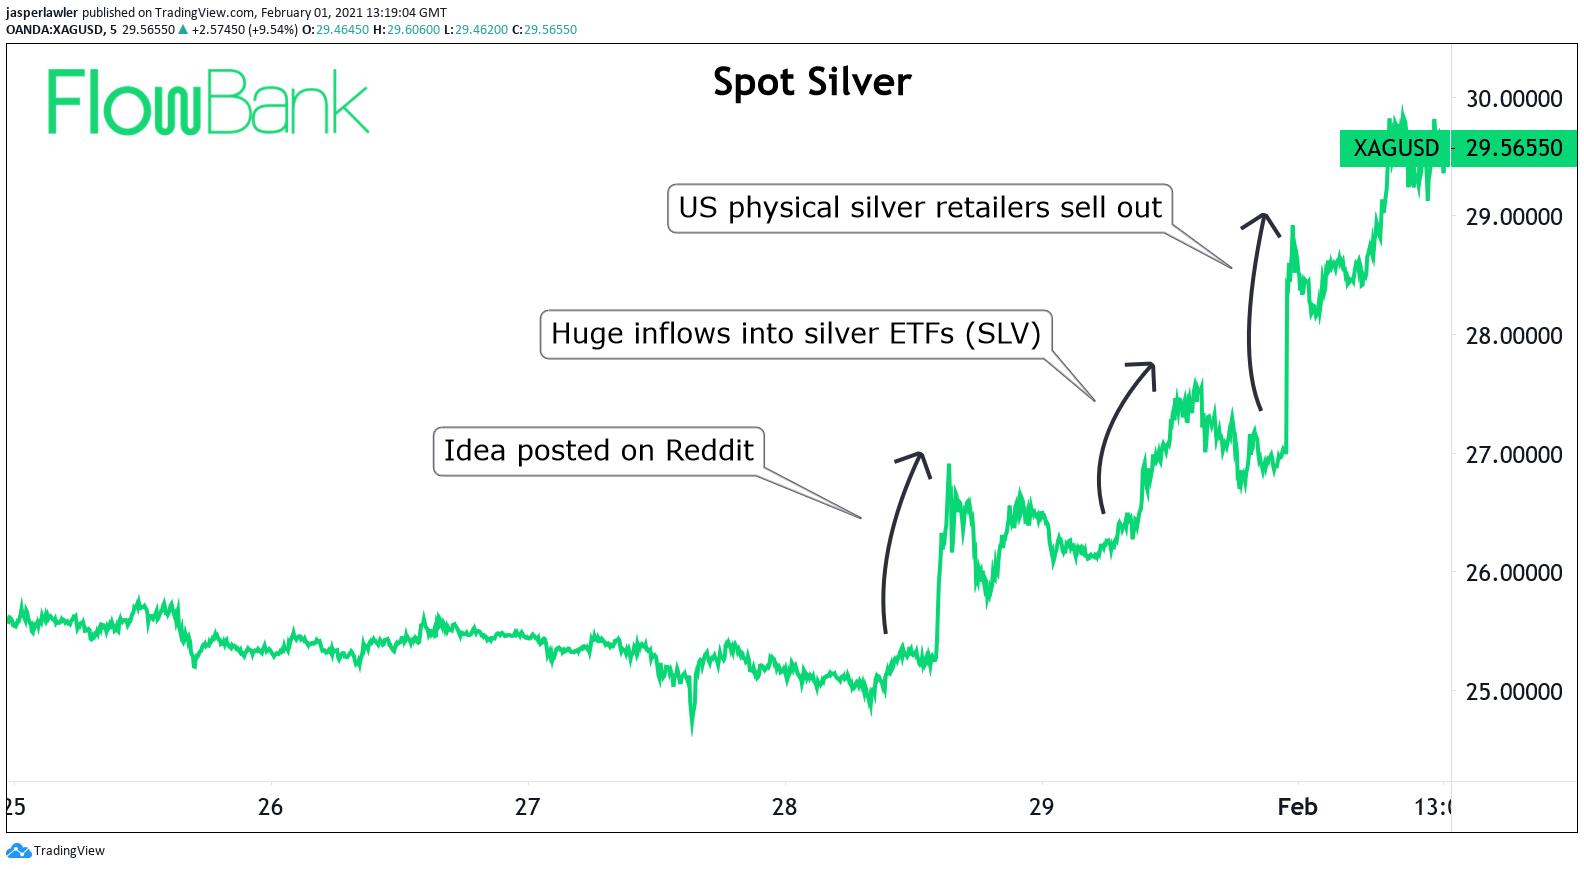 spot-silver-5-days-1